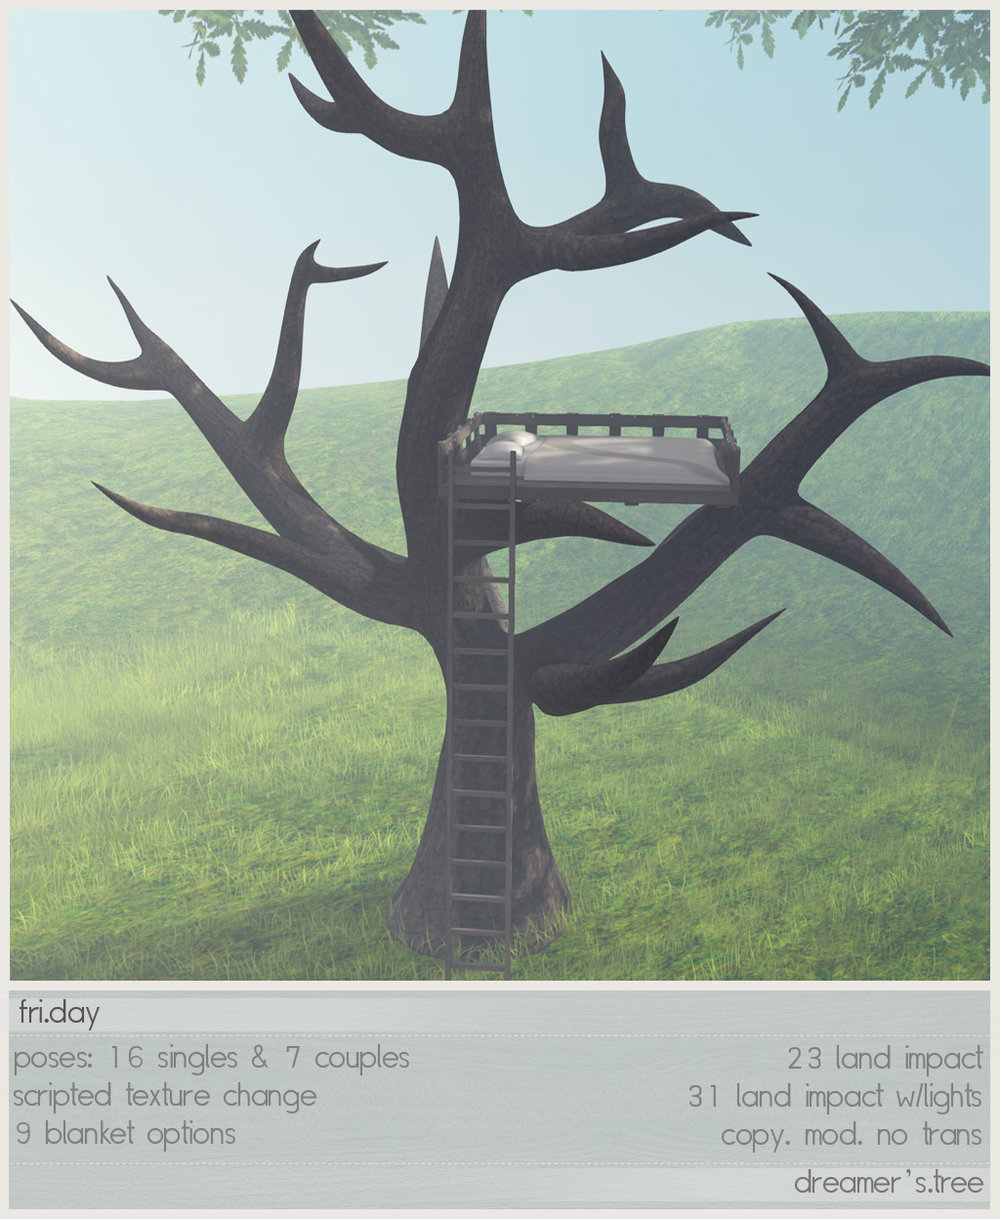 fri - Dreamer's Tree Ad.jpg